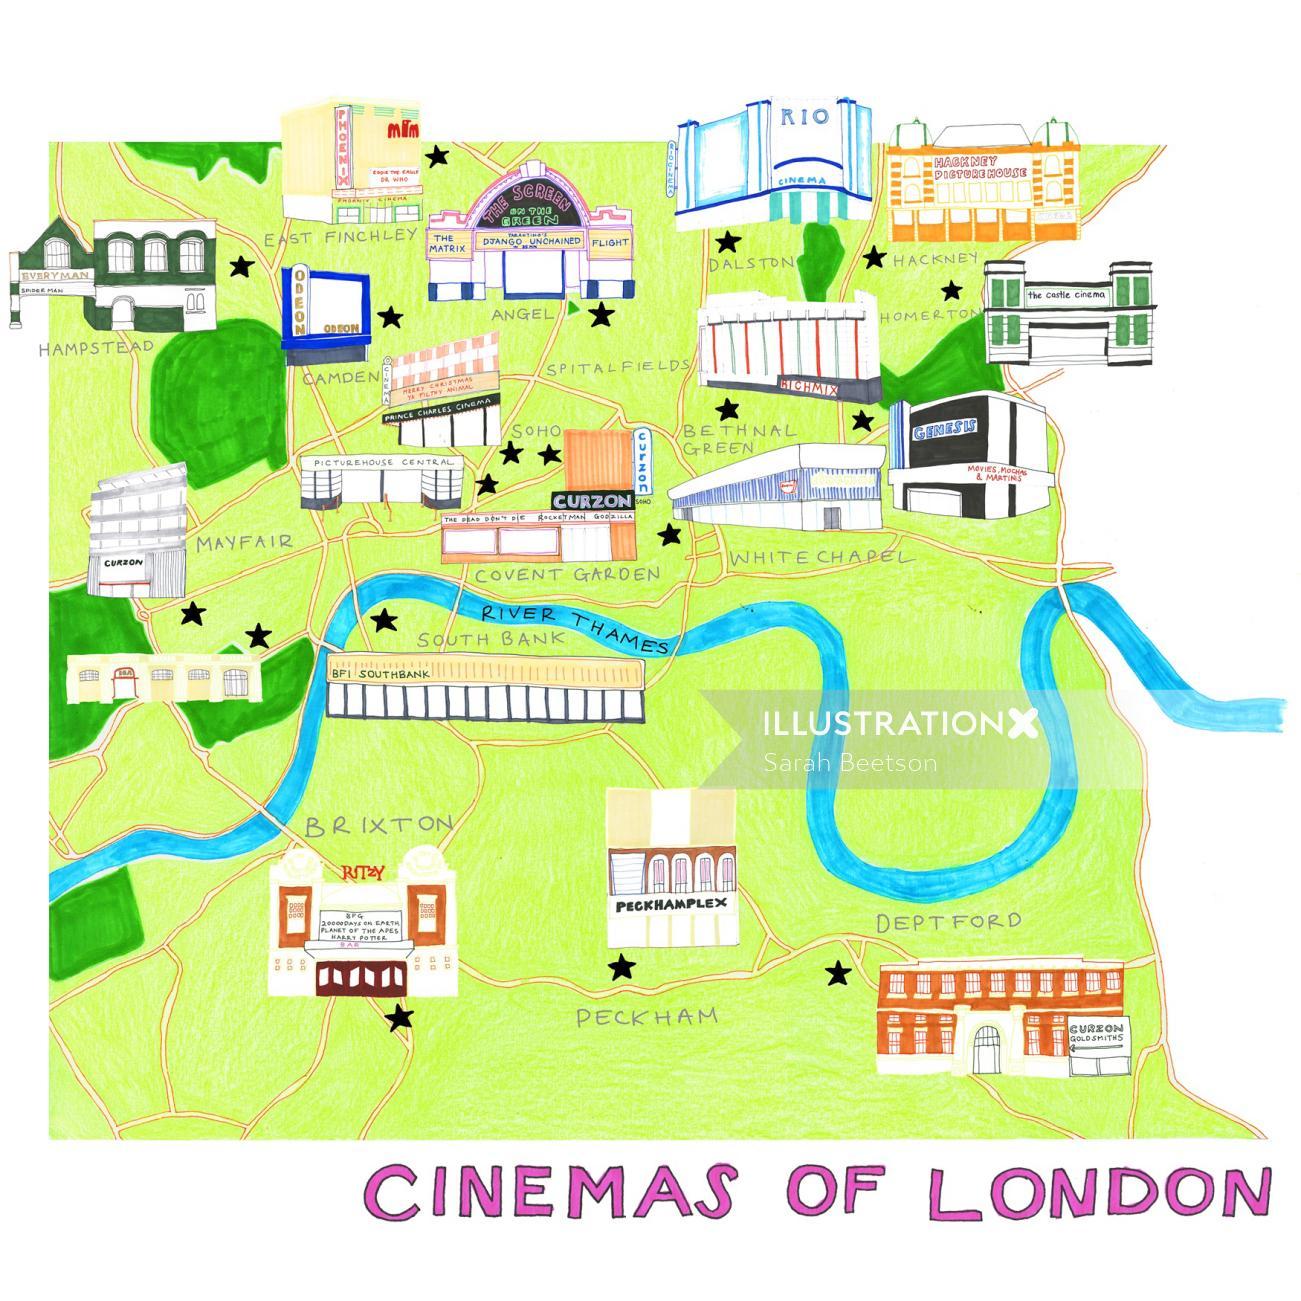 London cinemas! map illustration by Sarah Beetson